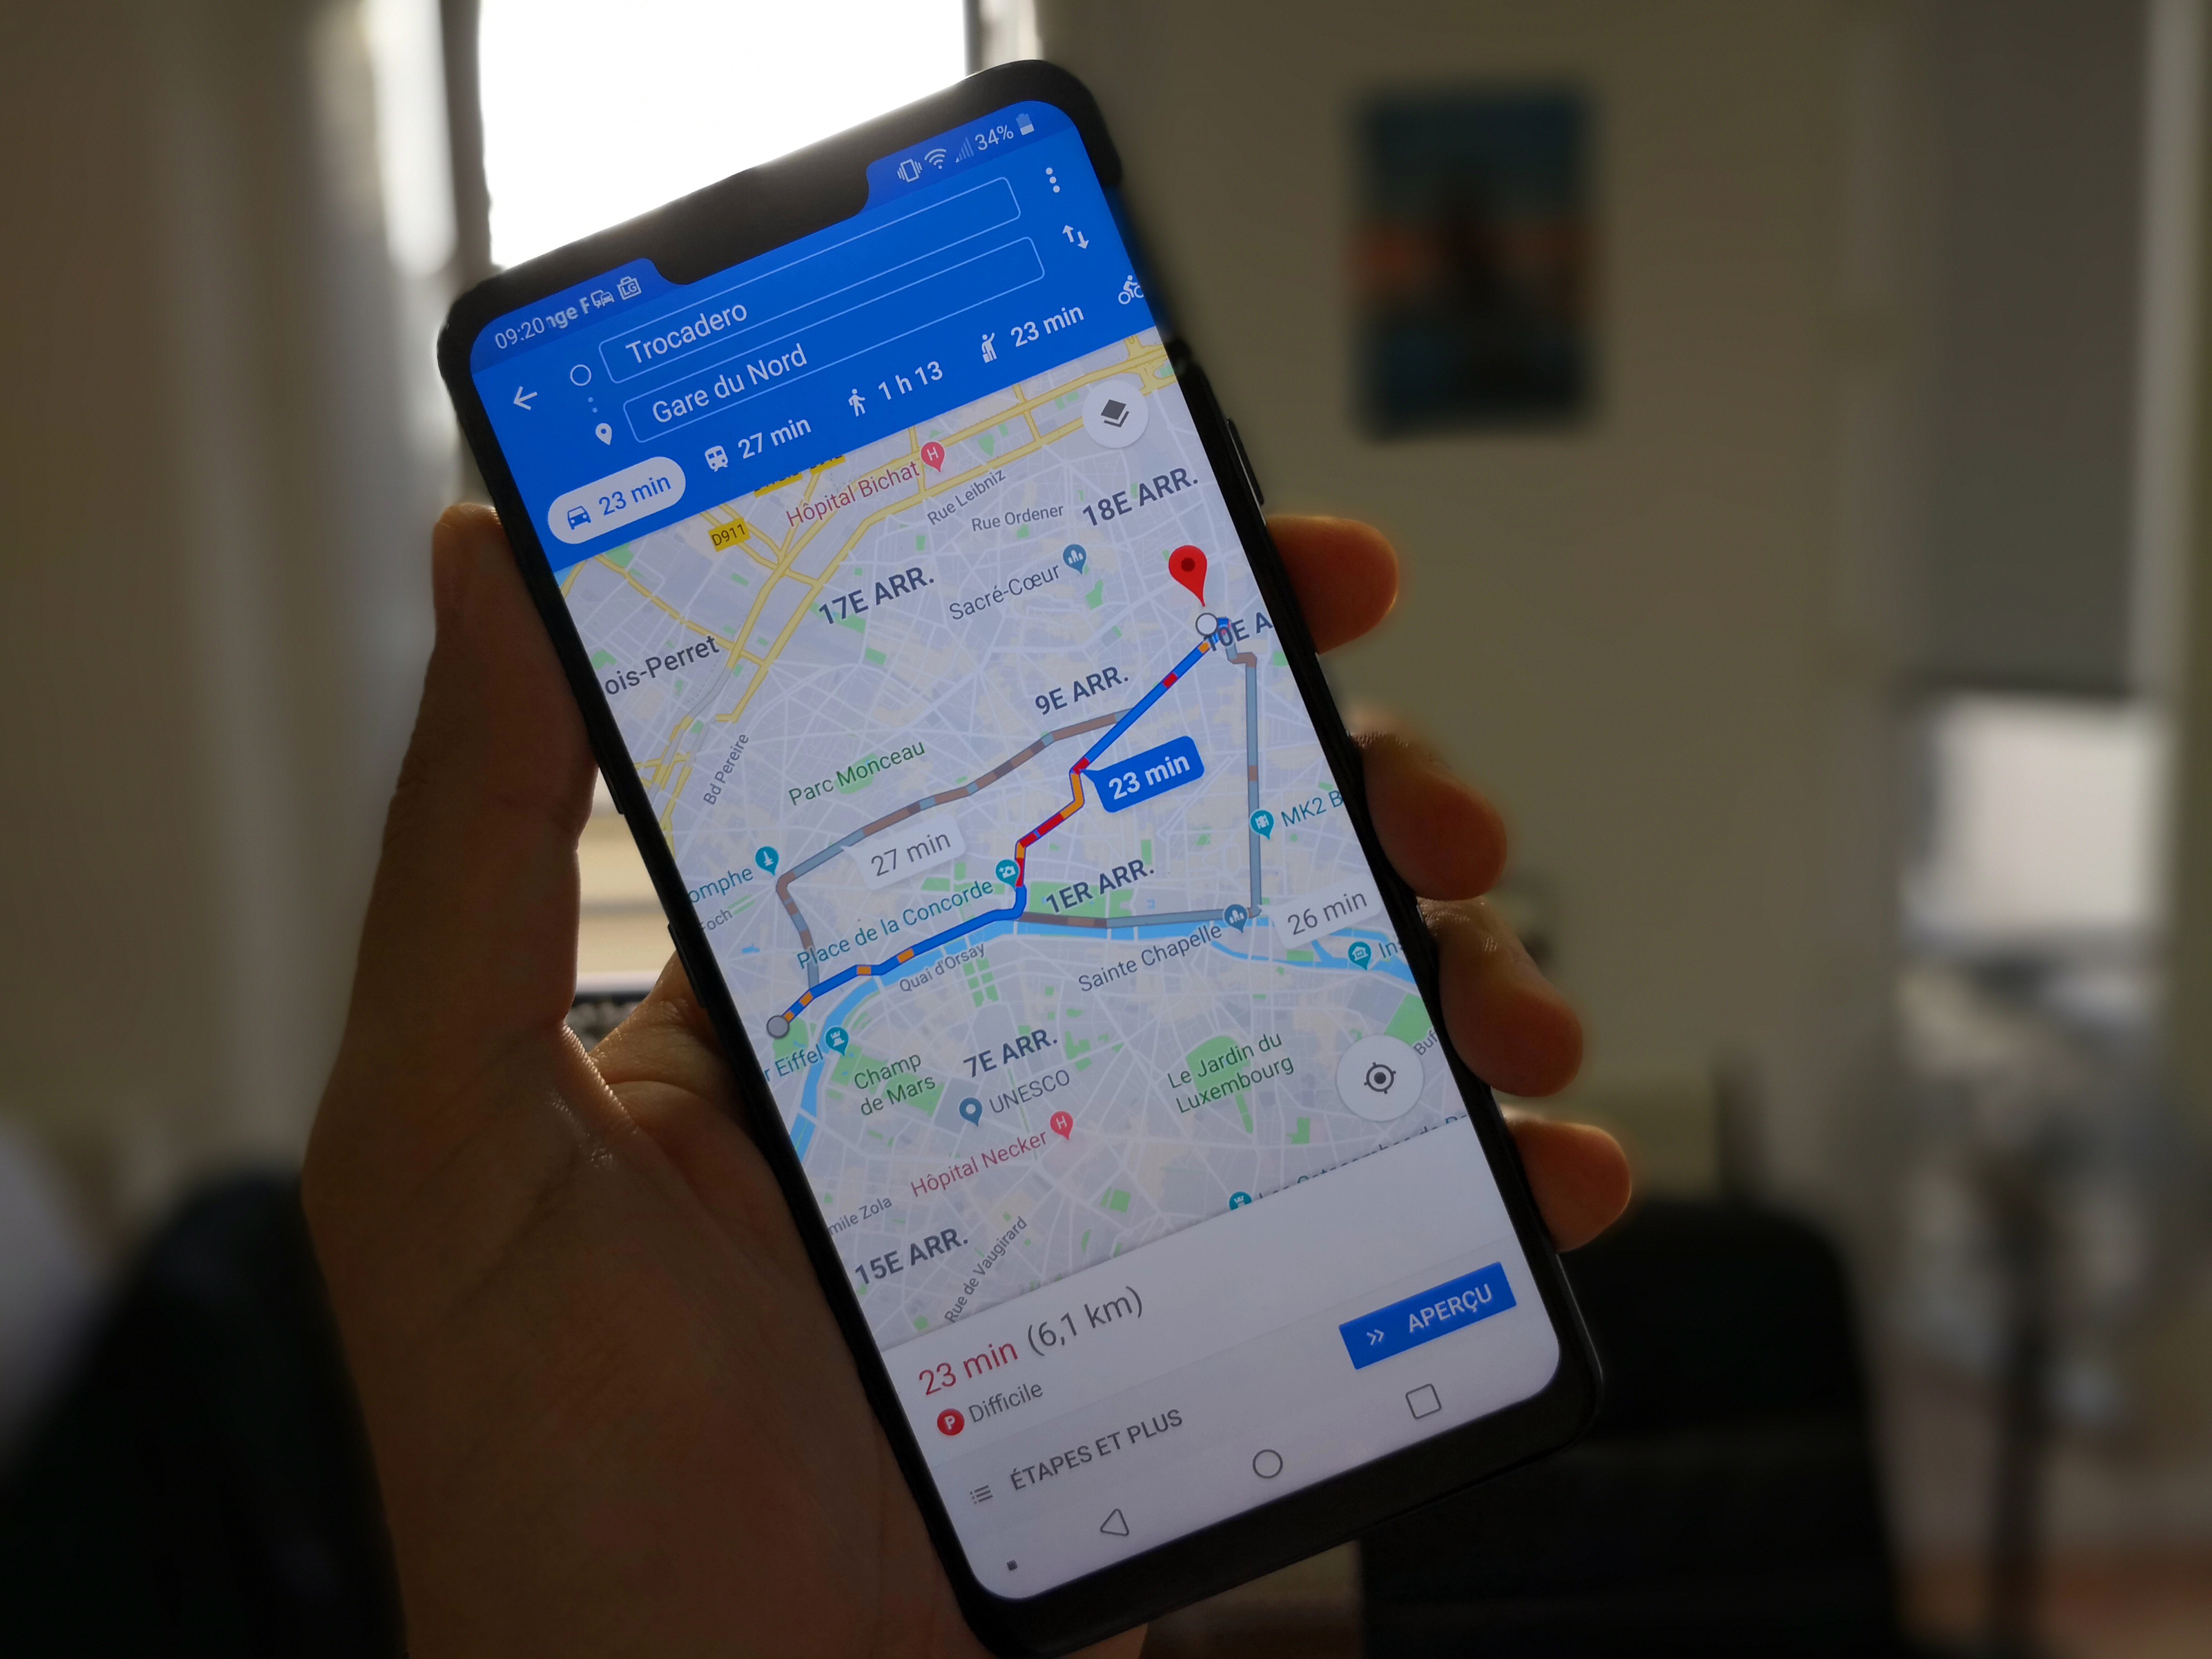 Bientôt signalés dans Google Maps — Radars